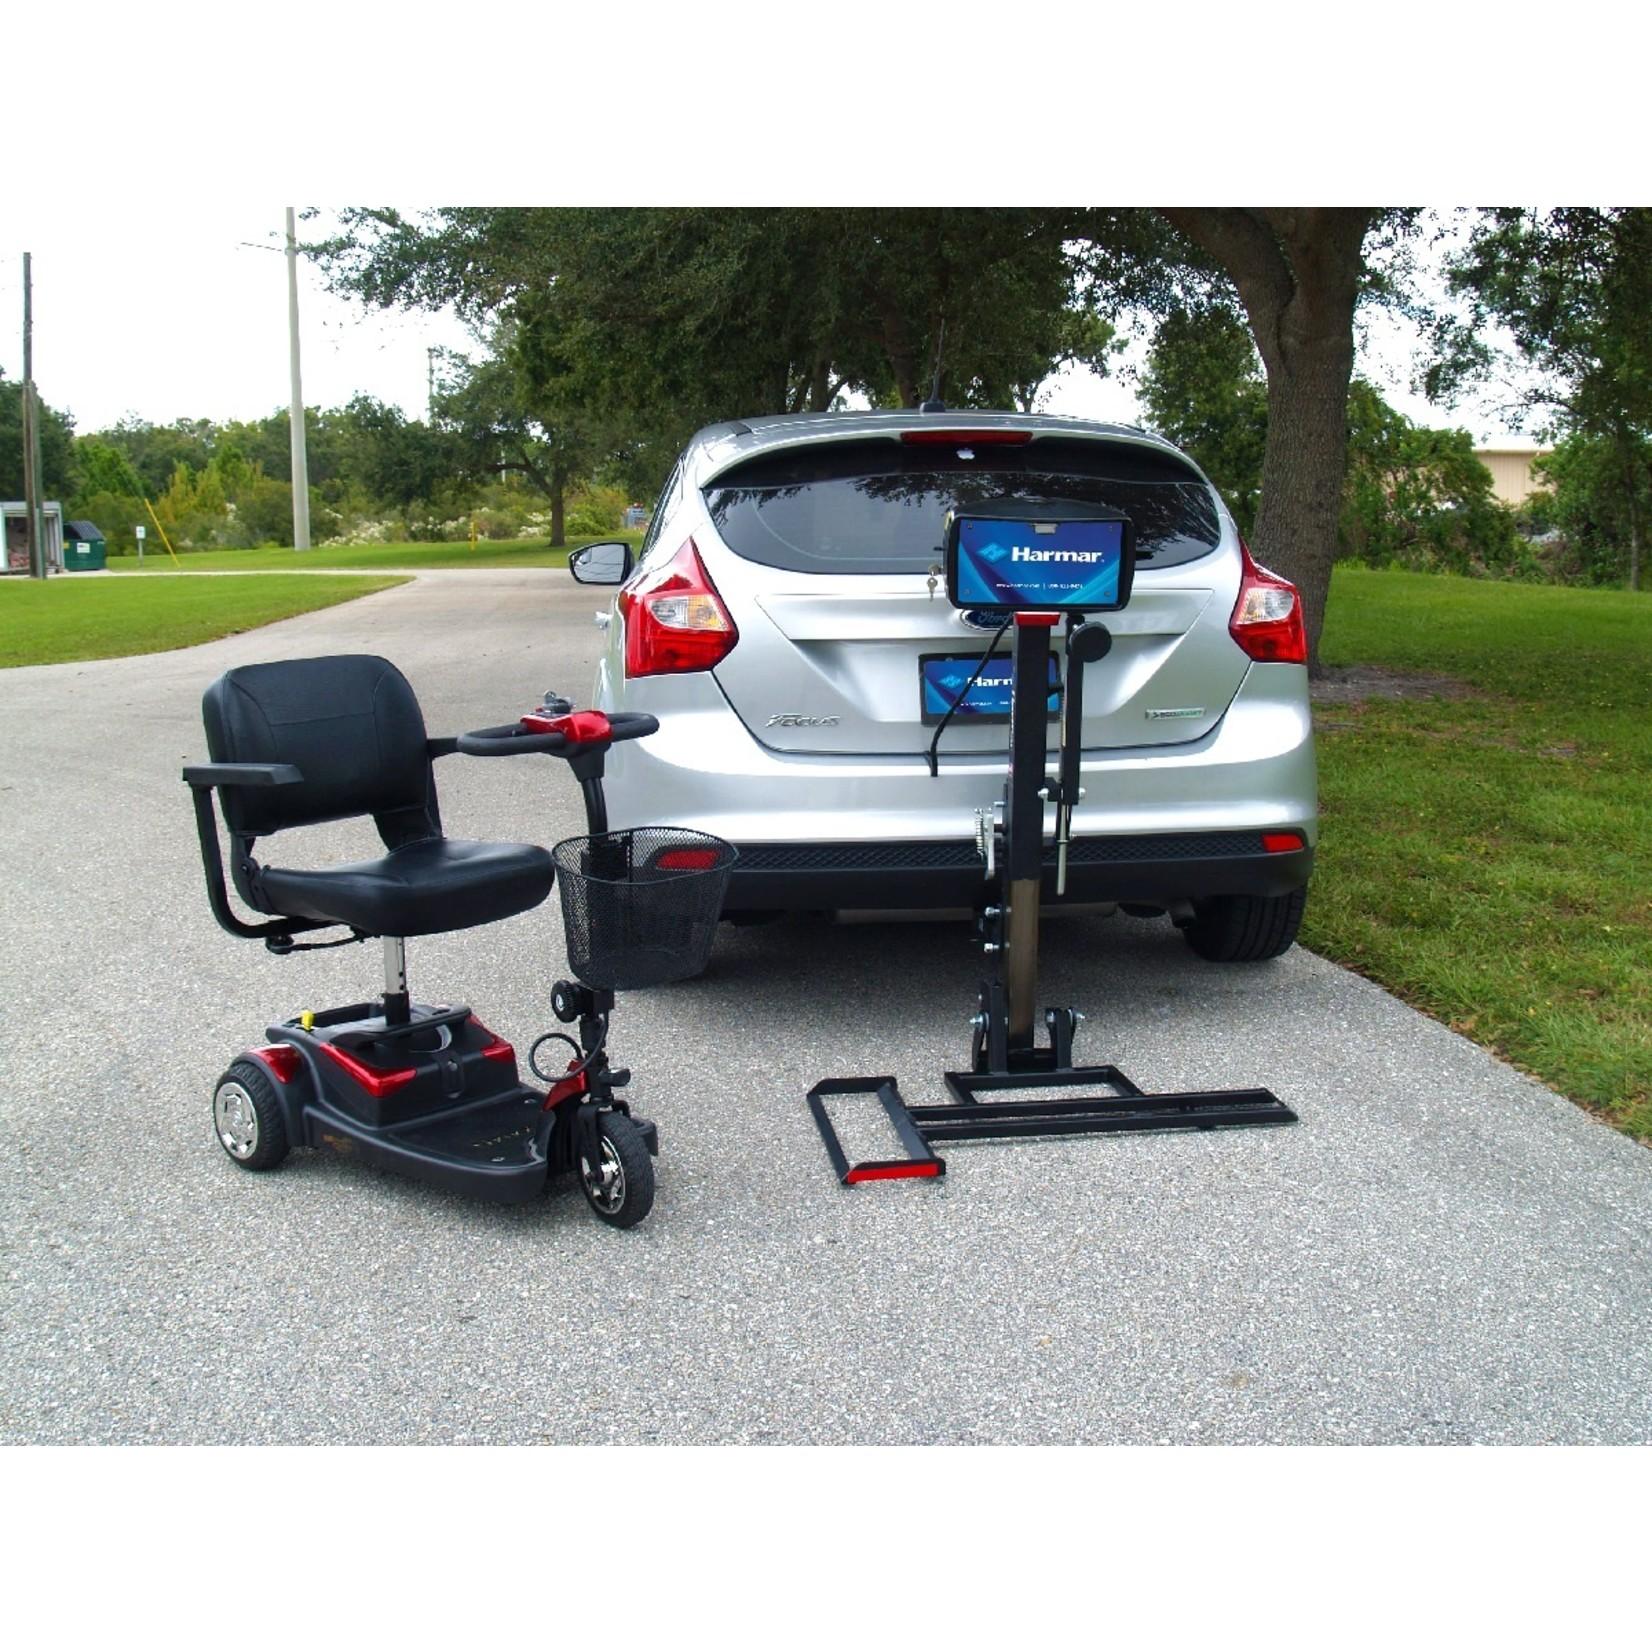 Harmar Mobility AL015 Micro Scooter Lift - 3 Wheel